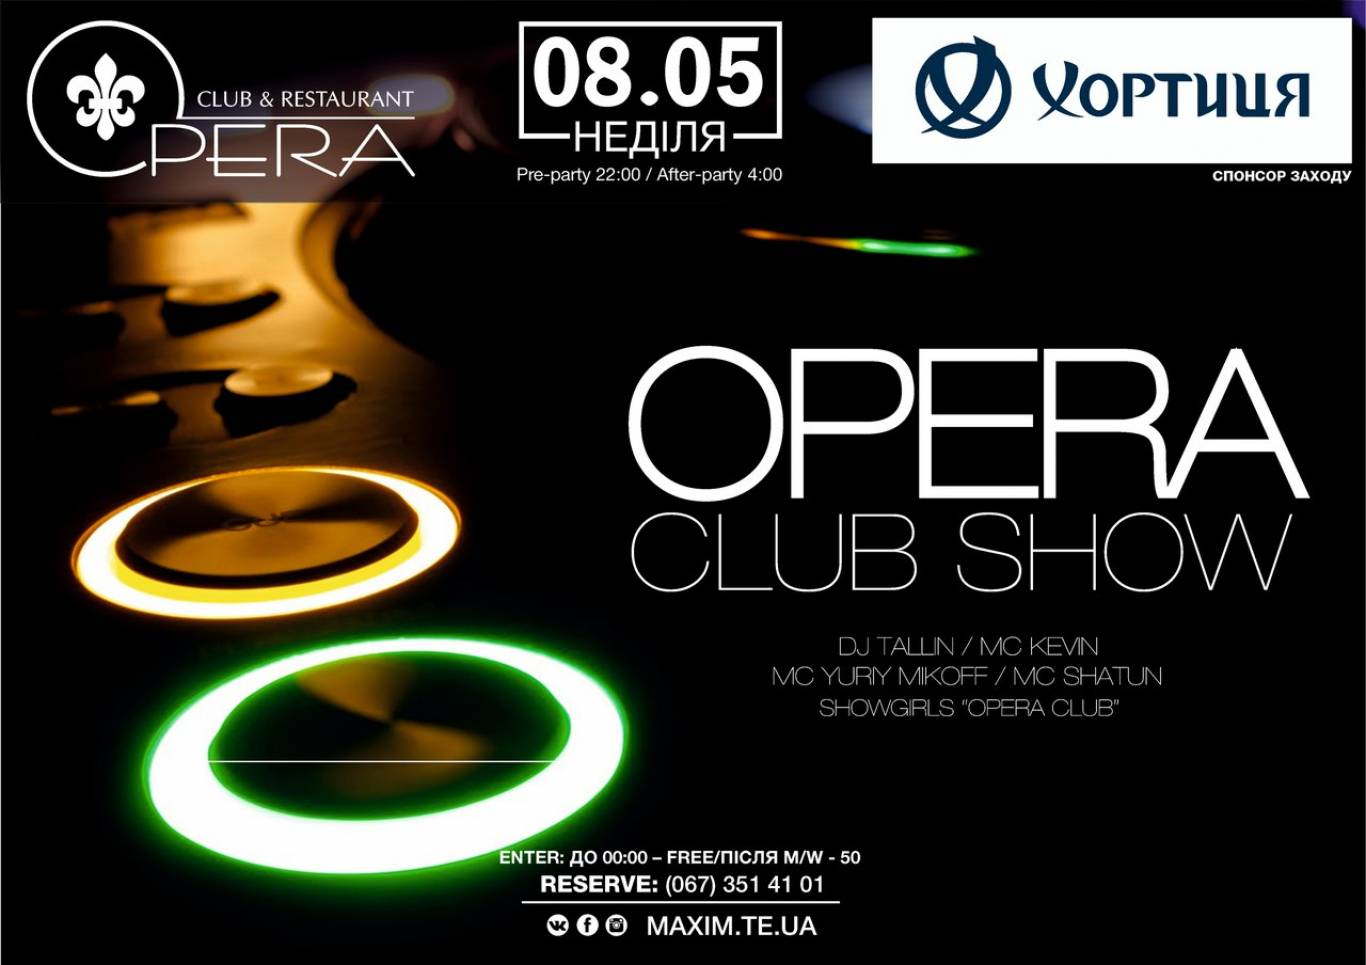 Вечірка Opera Club Show